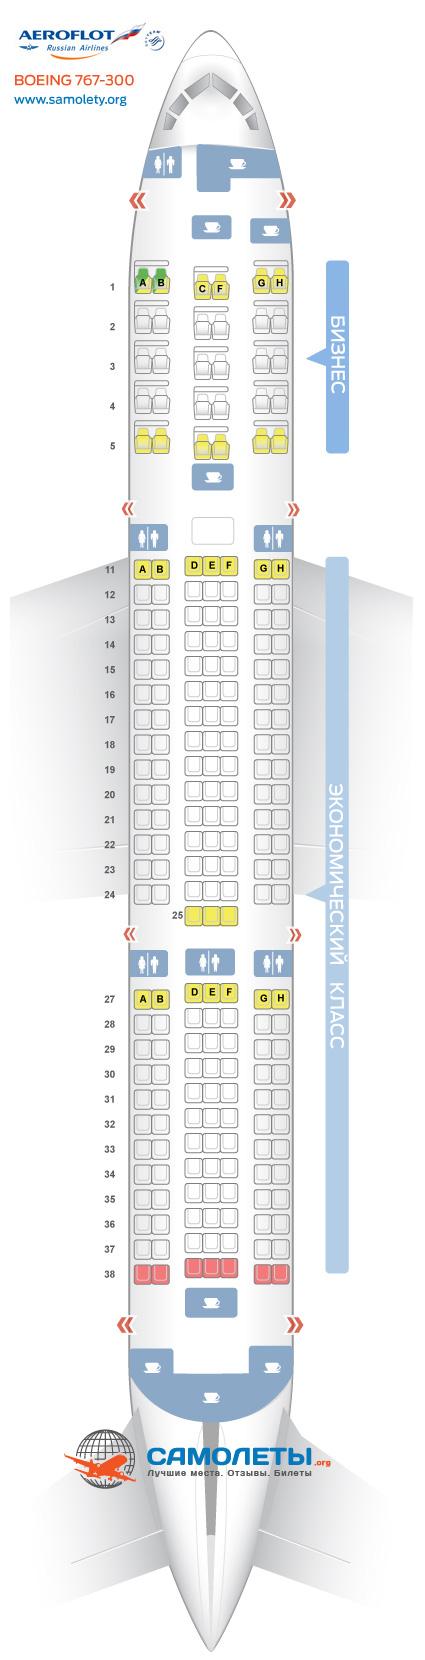 Аэрофлот Схема Boeing 767-300